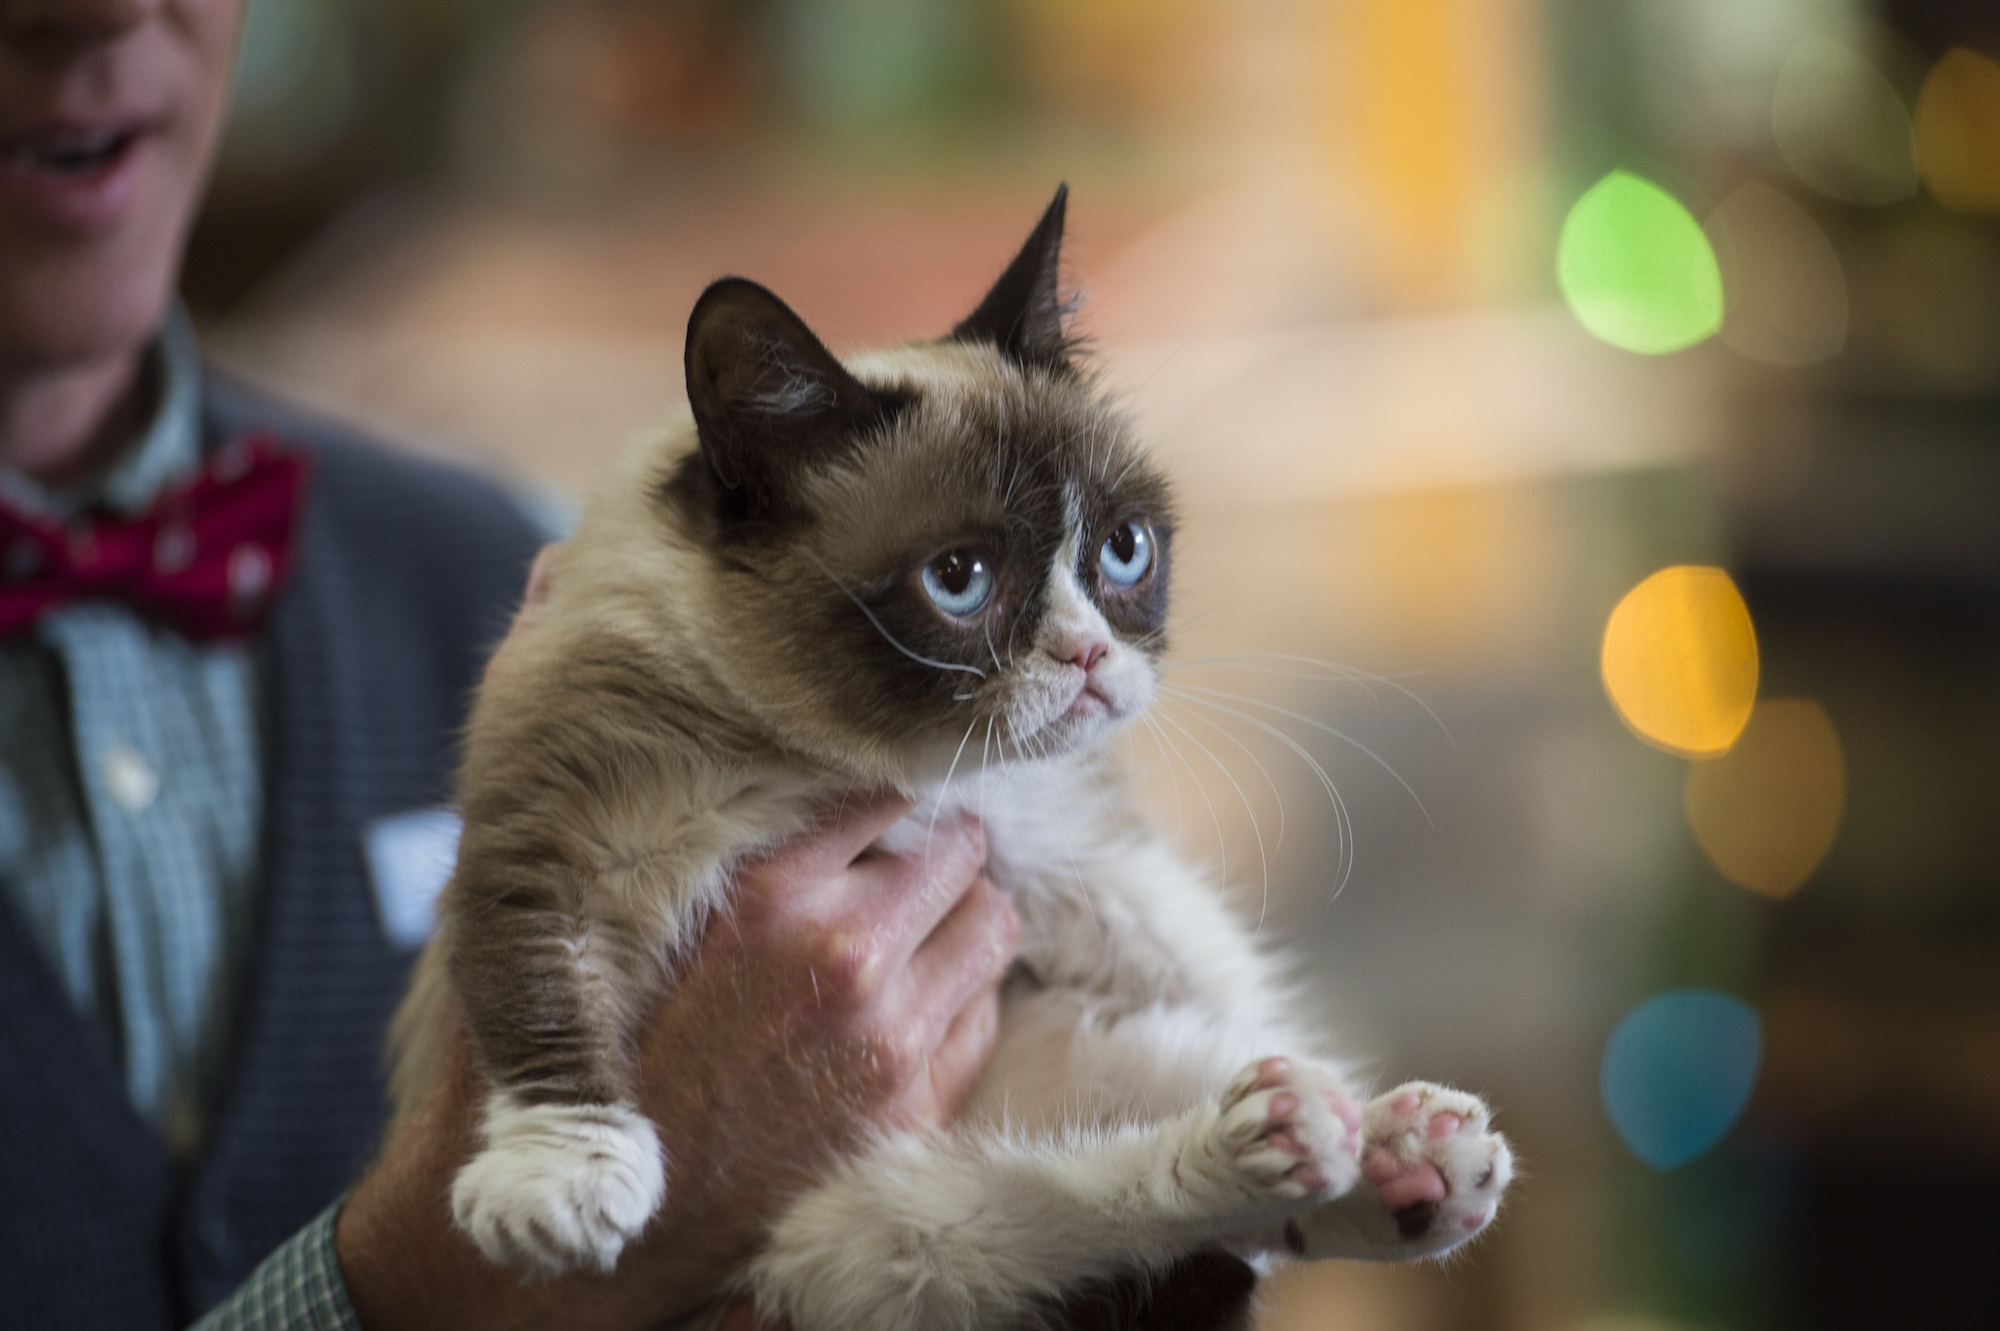 Should you watch grumpy cats worst christmas ever a handy should you watch grumpy cats worst christmas ever a handy personalized guide indiewire altavistaventures Choice Image